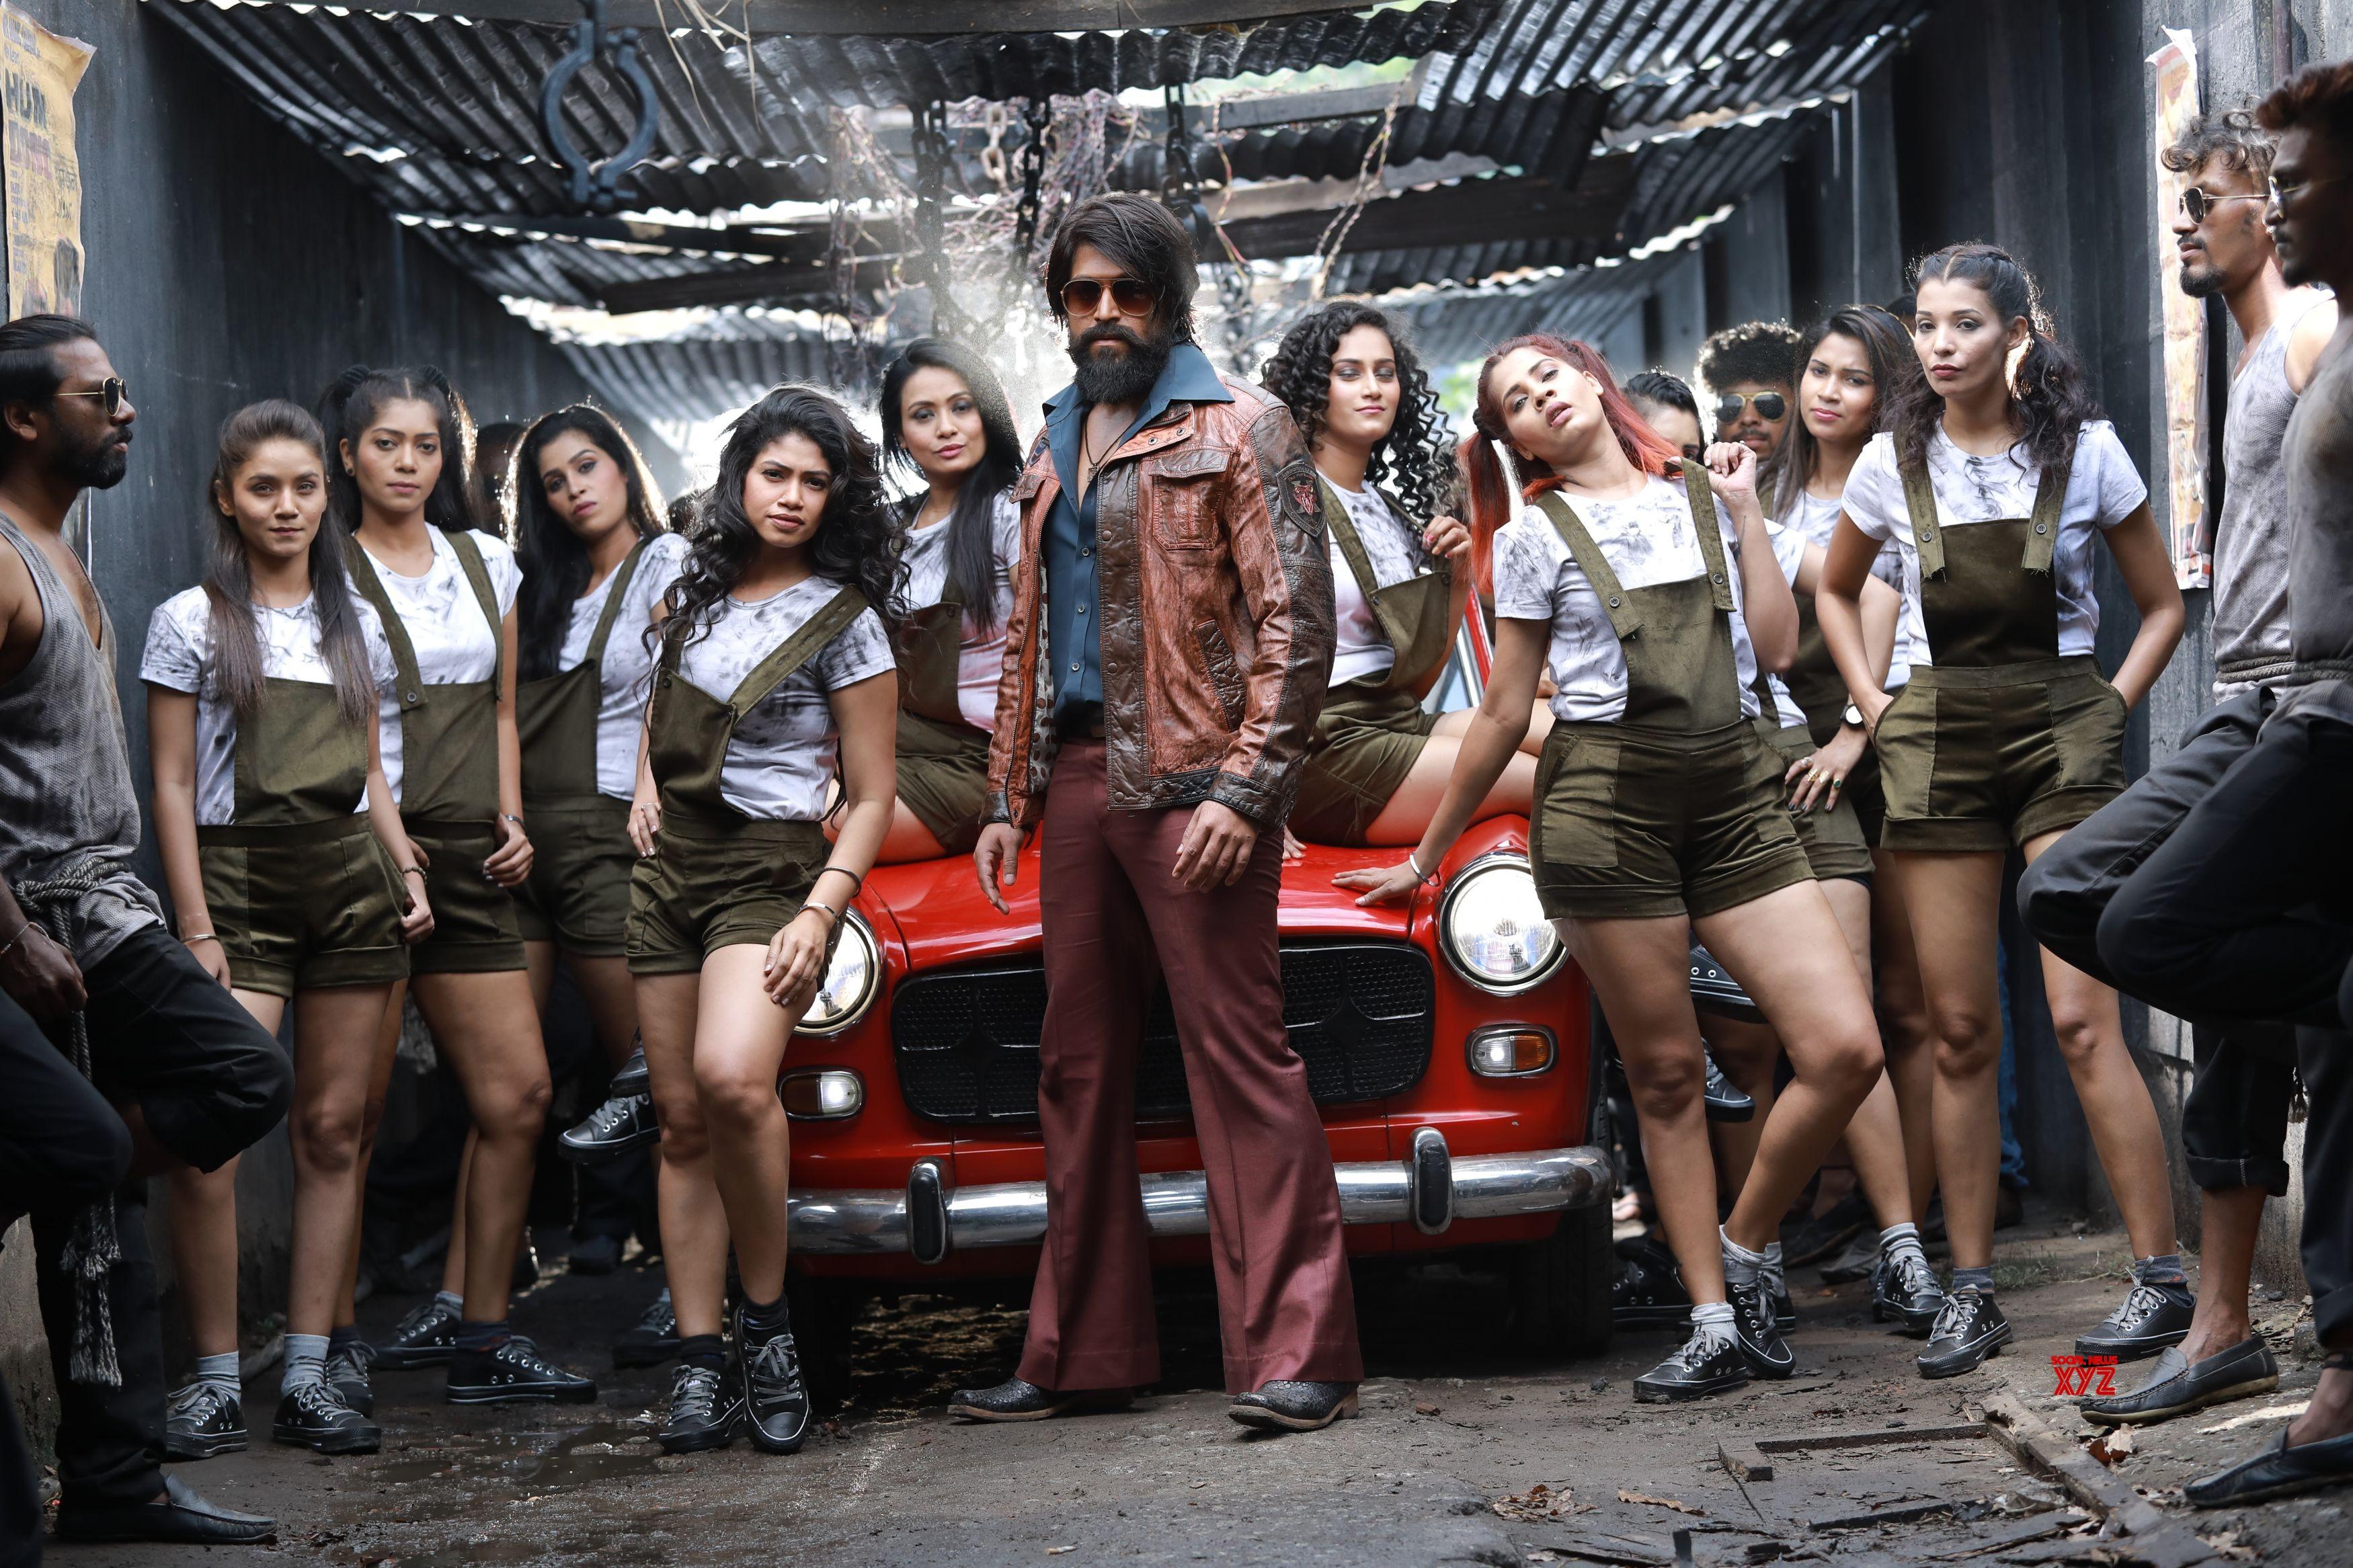 Kgf Hindi Review A Messy Monstrosity Rating Social News Xyz